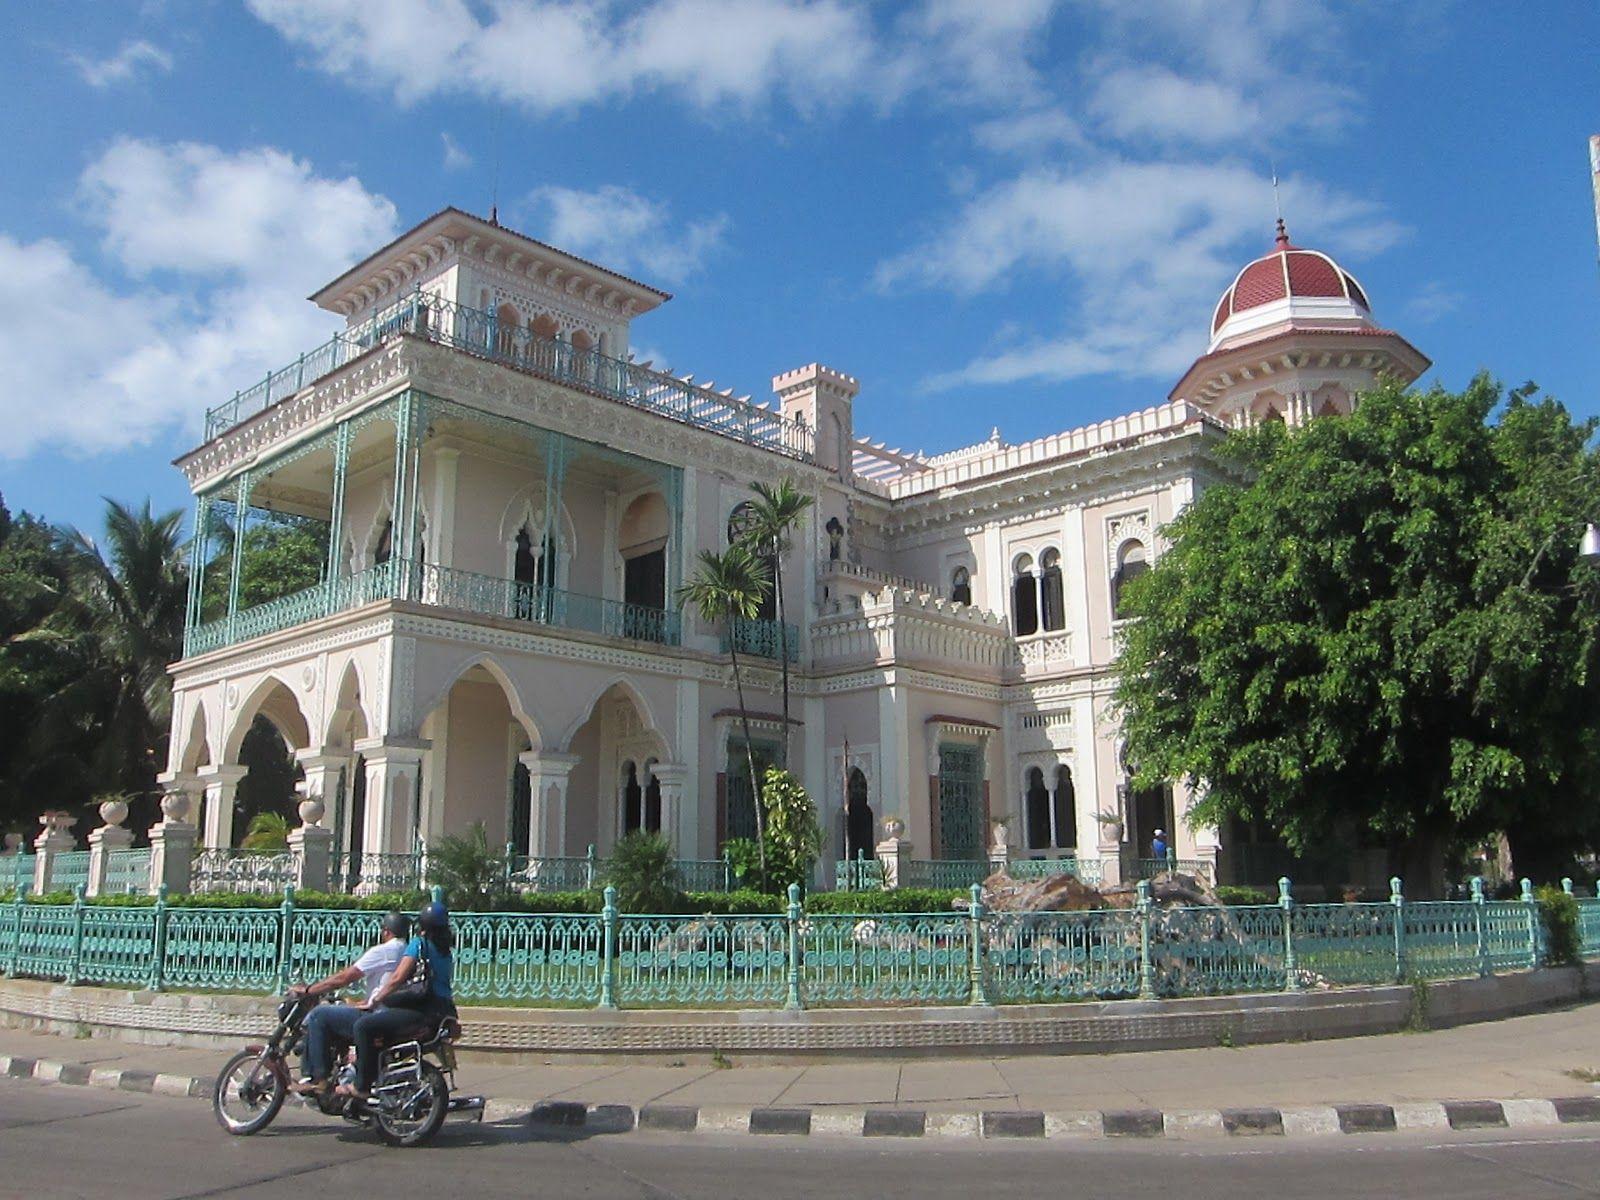 Cuban Mansions The Moorishstyle Palacio de Valle